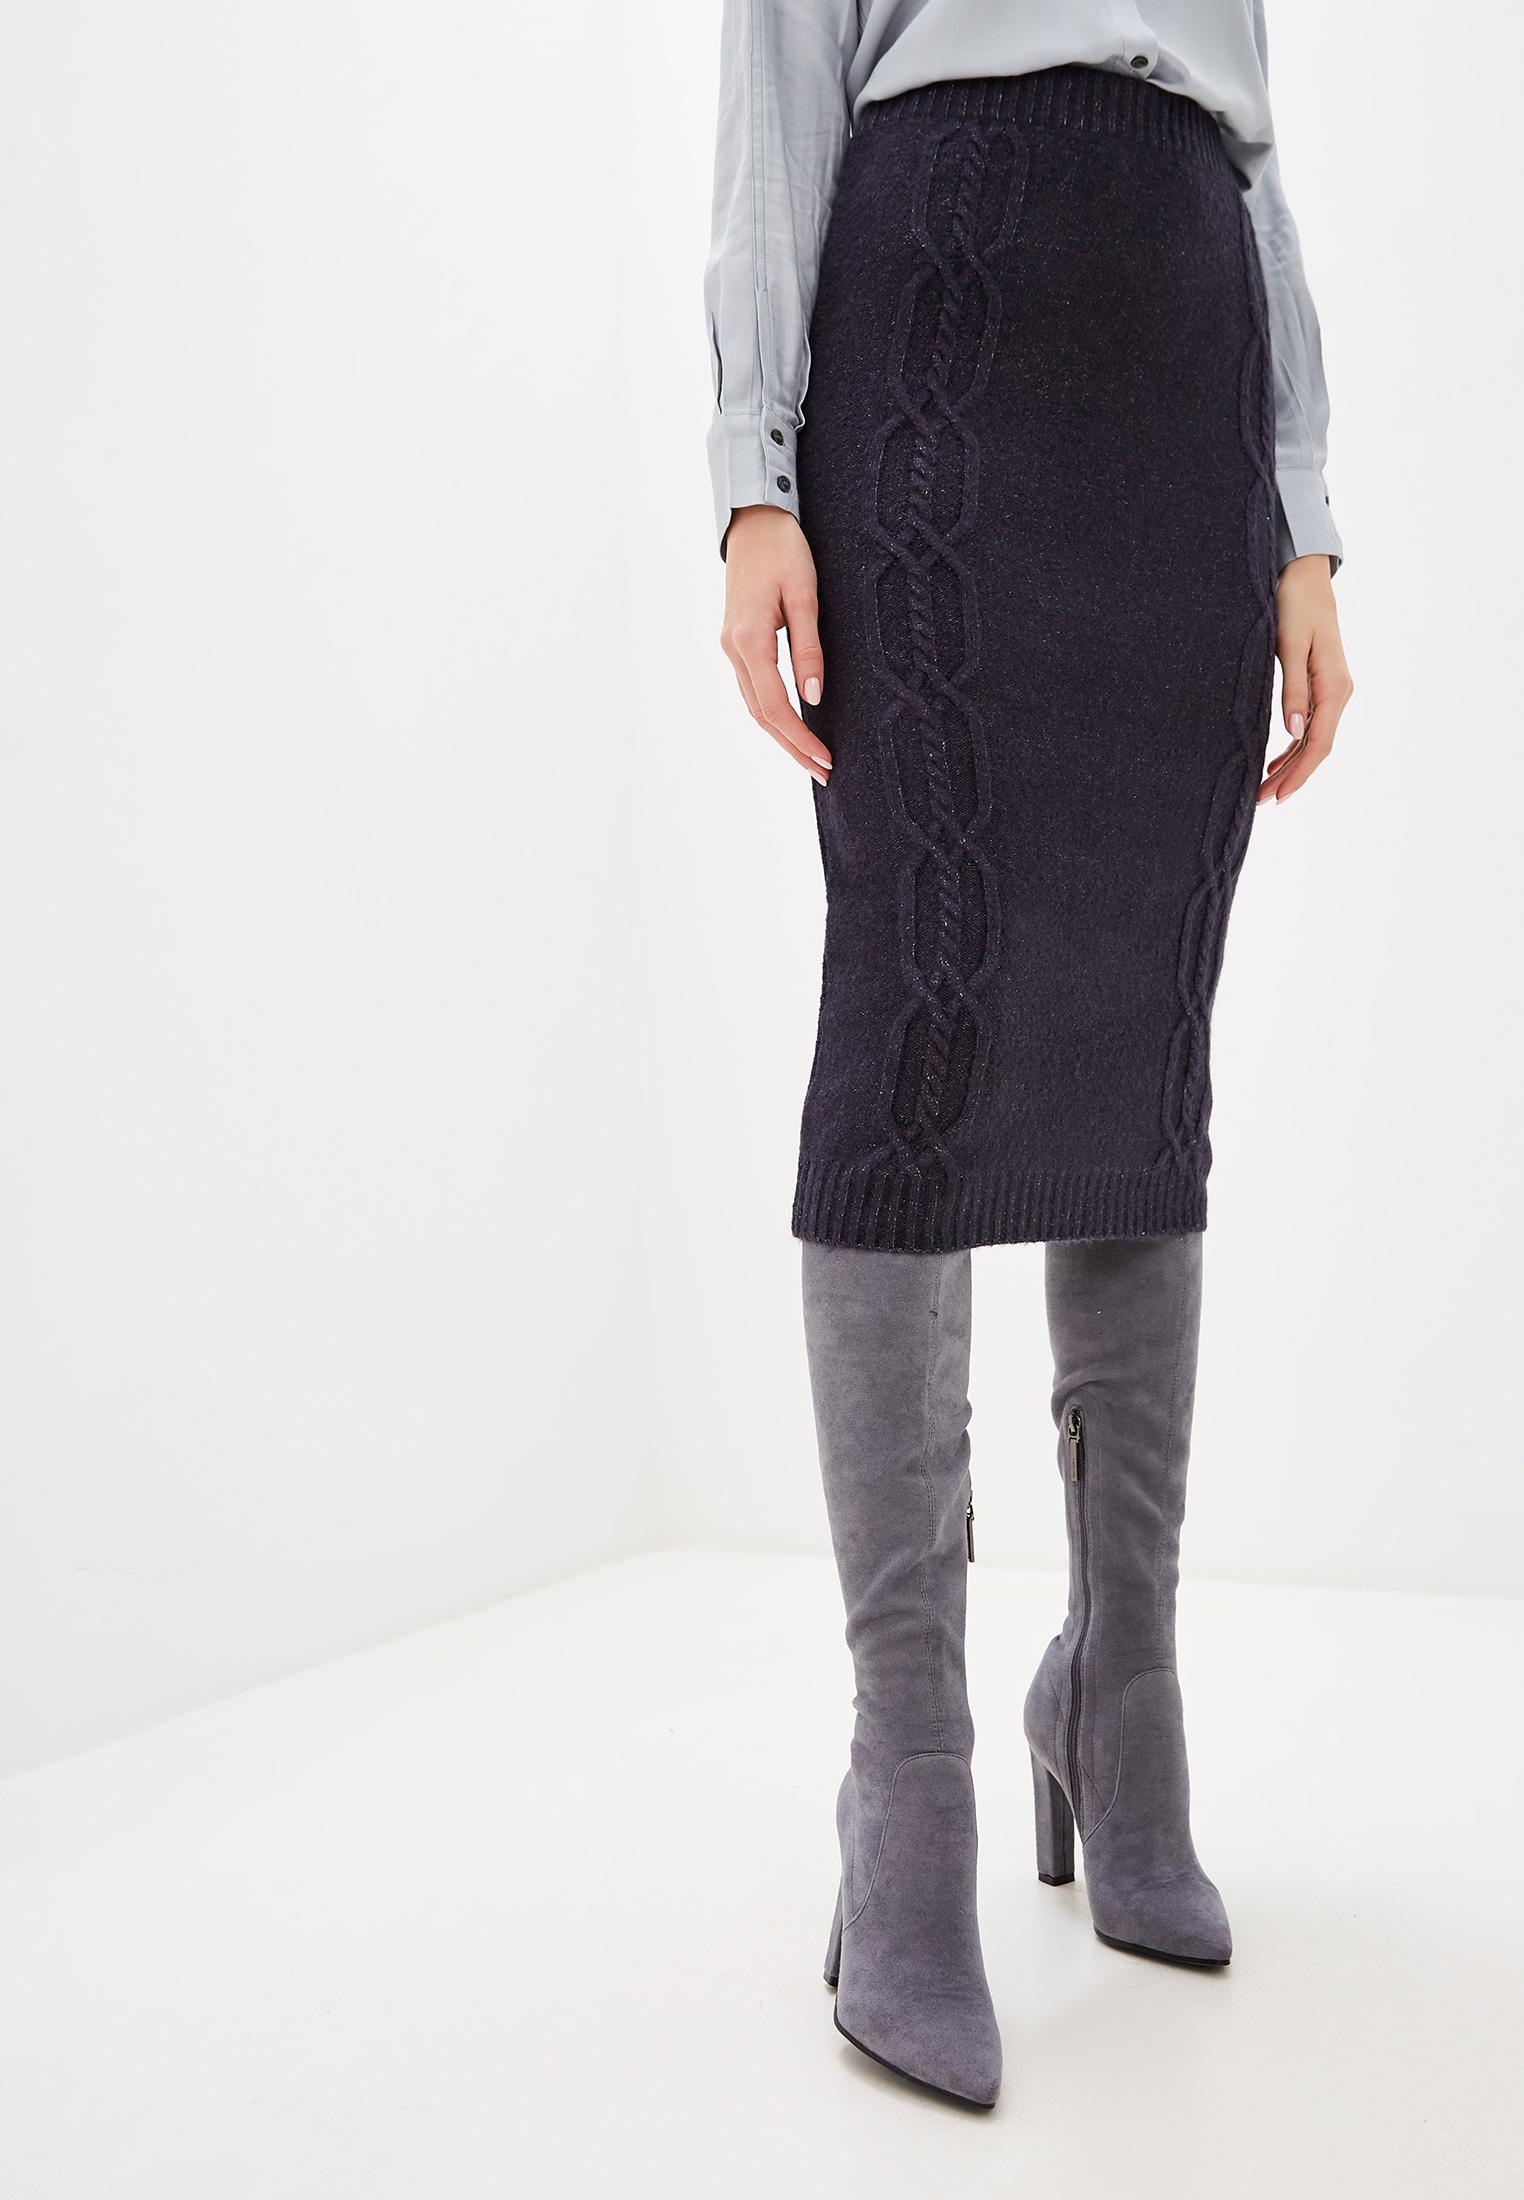 Прямая юбка Sela (Сэла) SKsw-118/906-9453